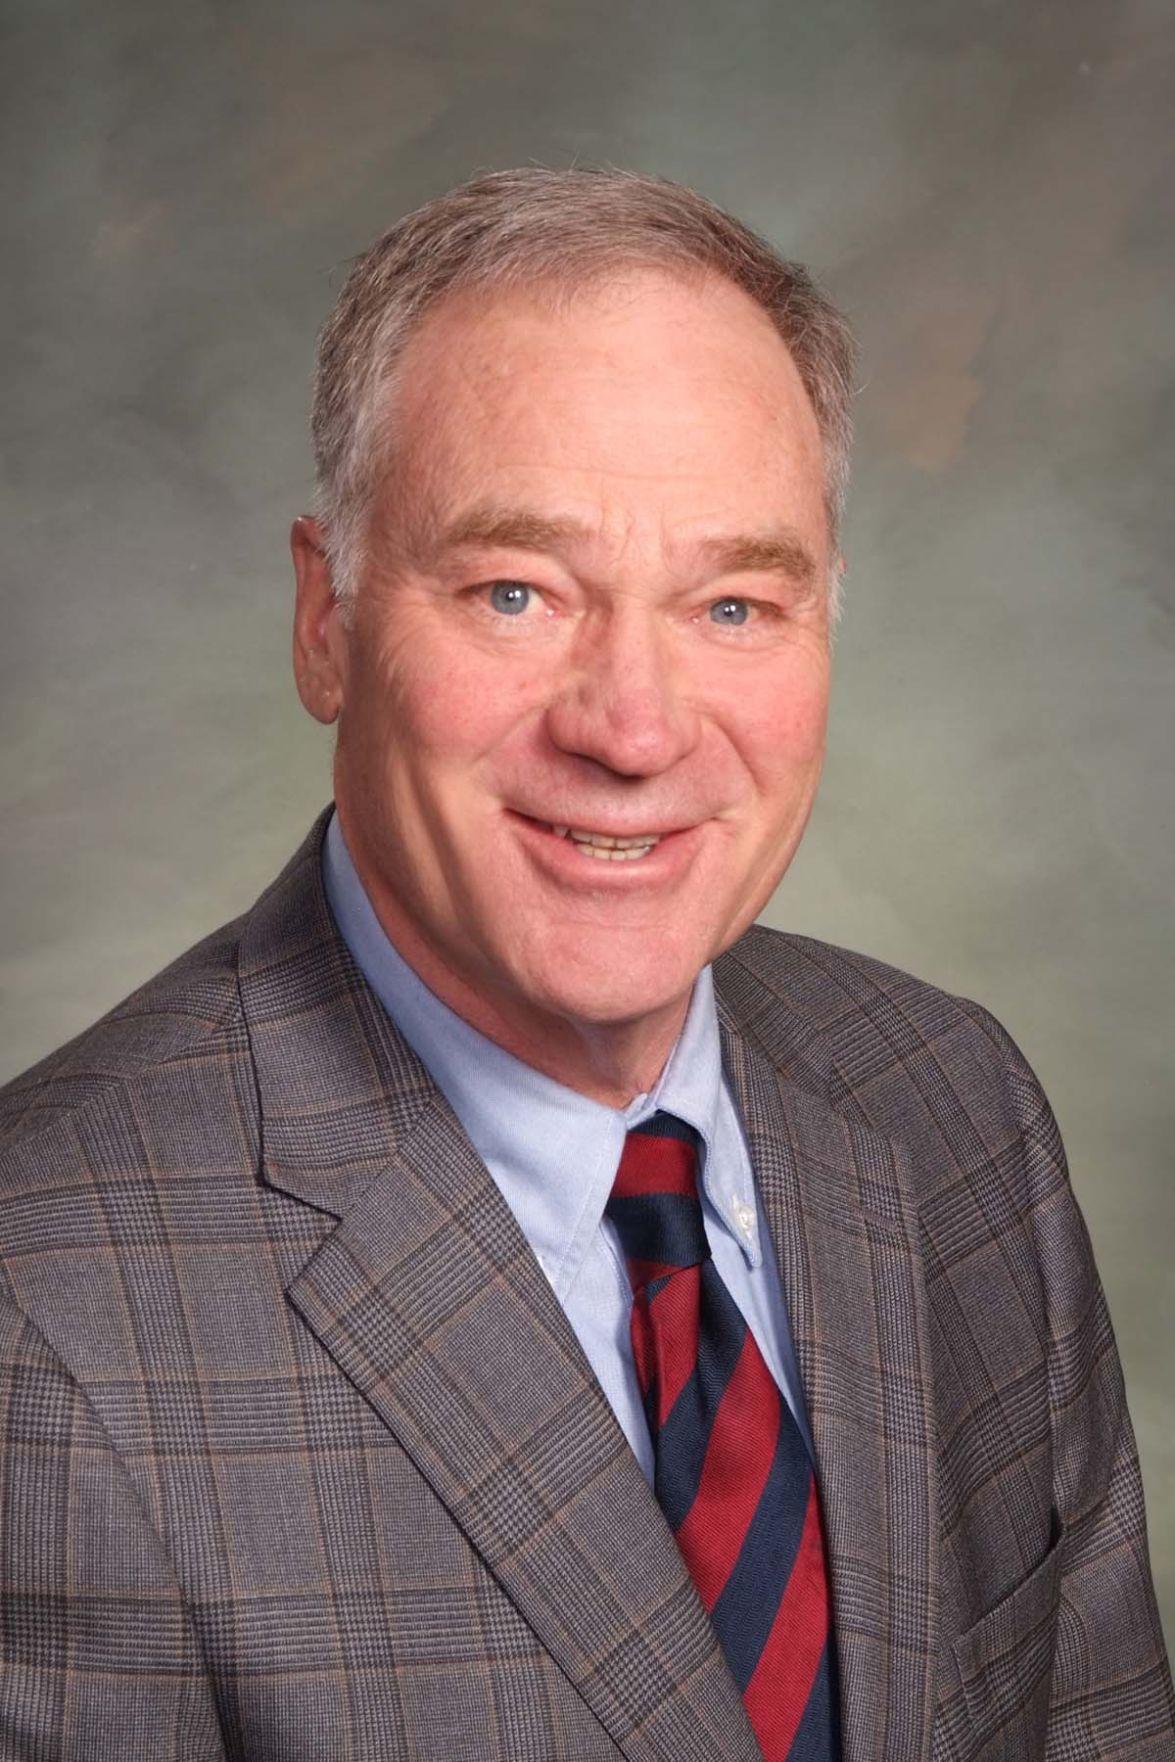 Sen. Dave Kinskey